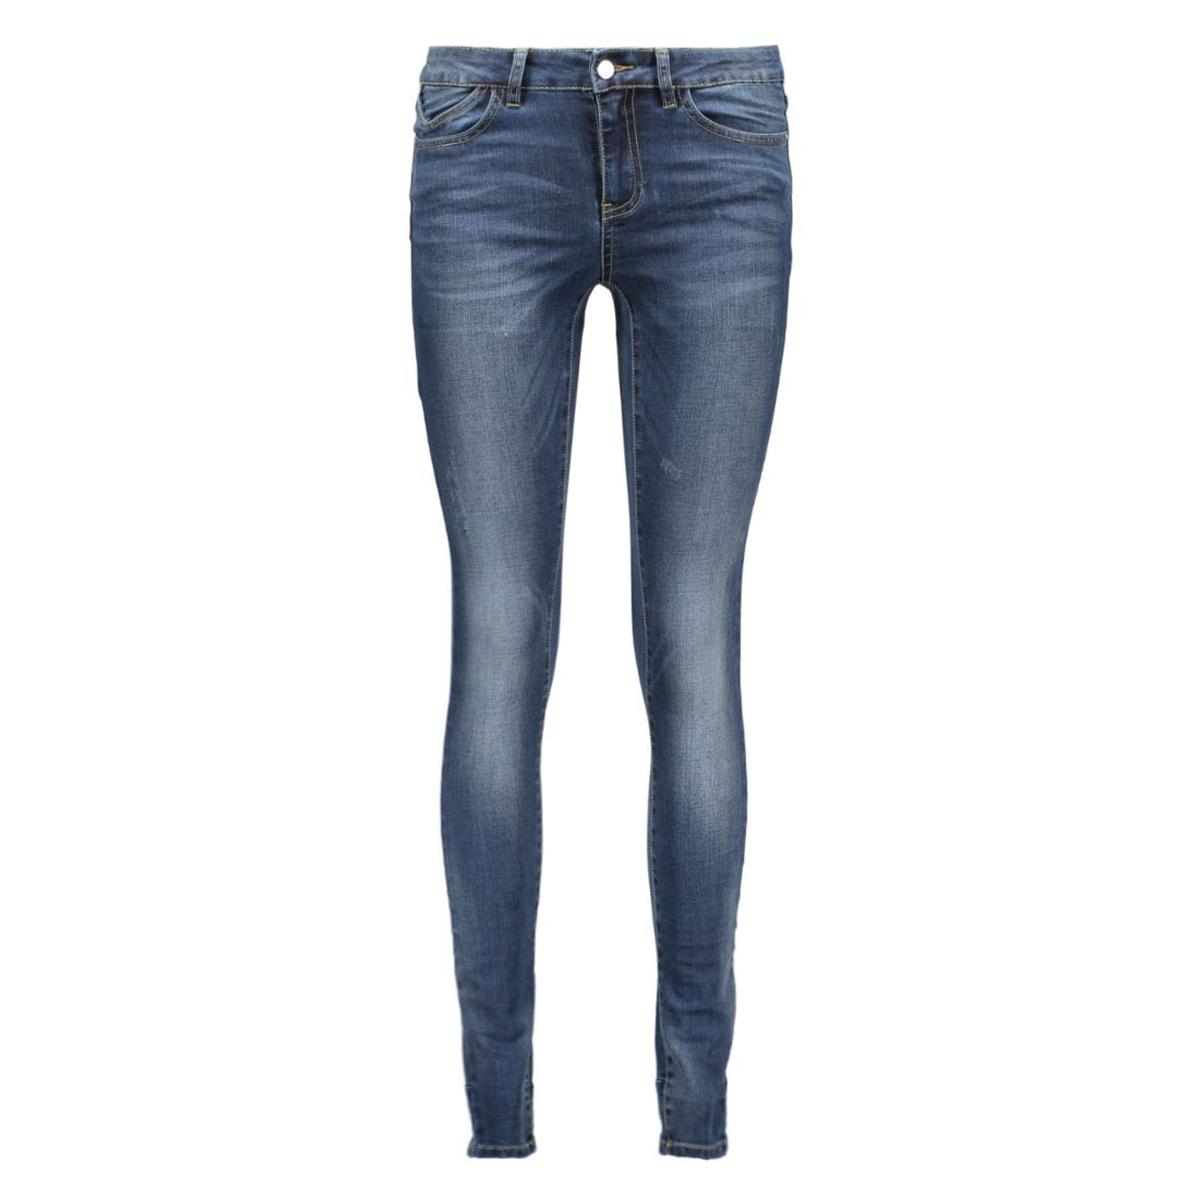 vicommit rw 5p hk0122 db cut gv 14036616 vila jeans dark blue denim